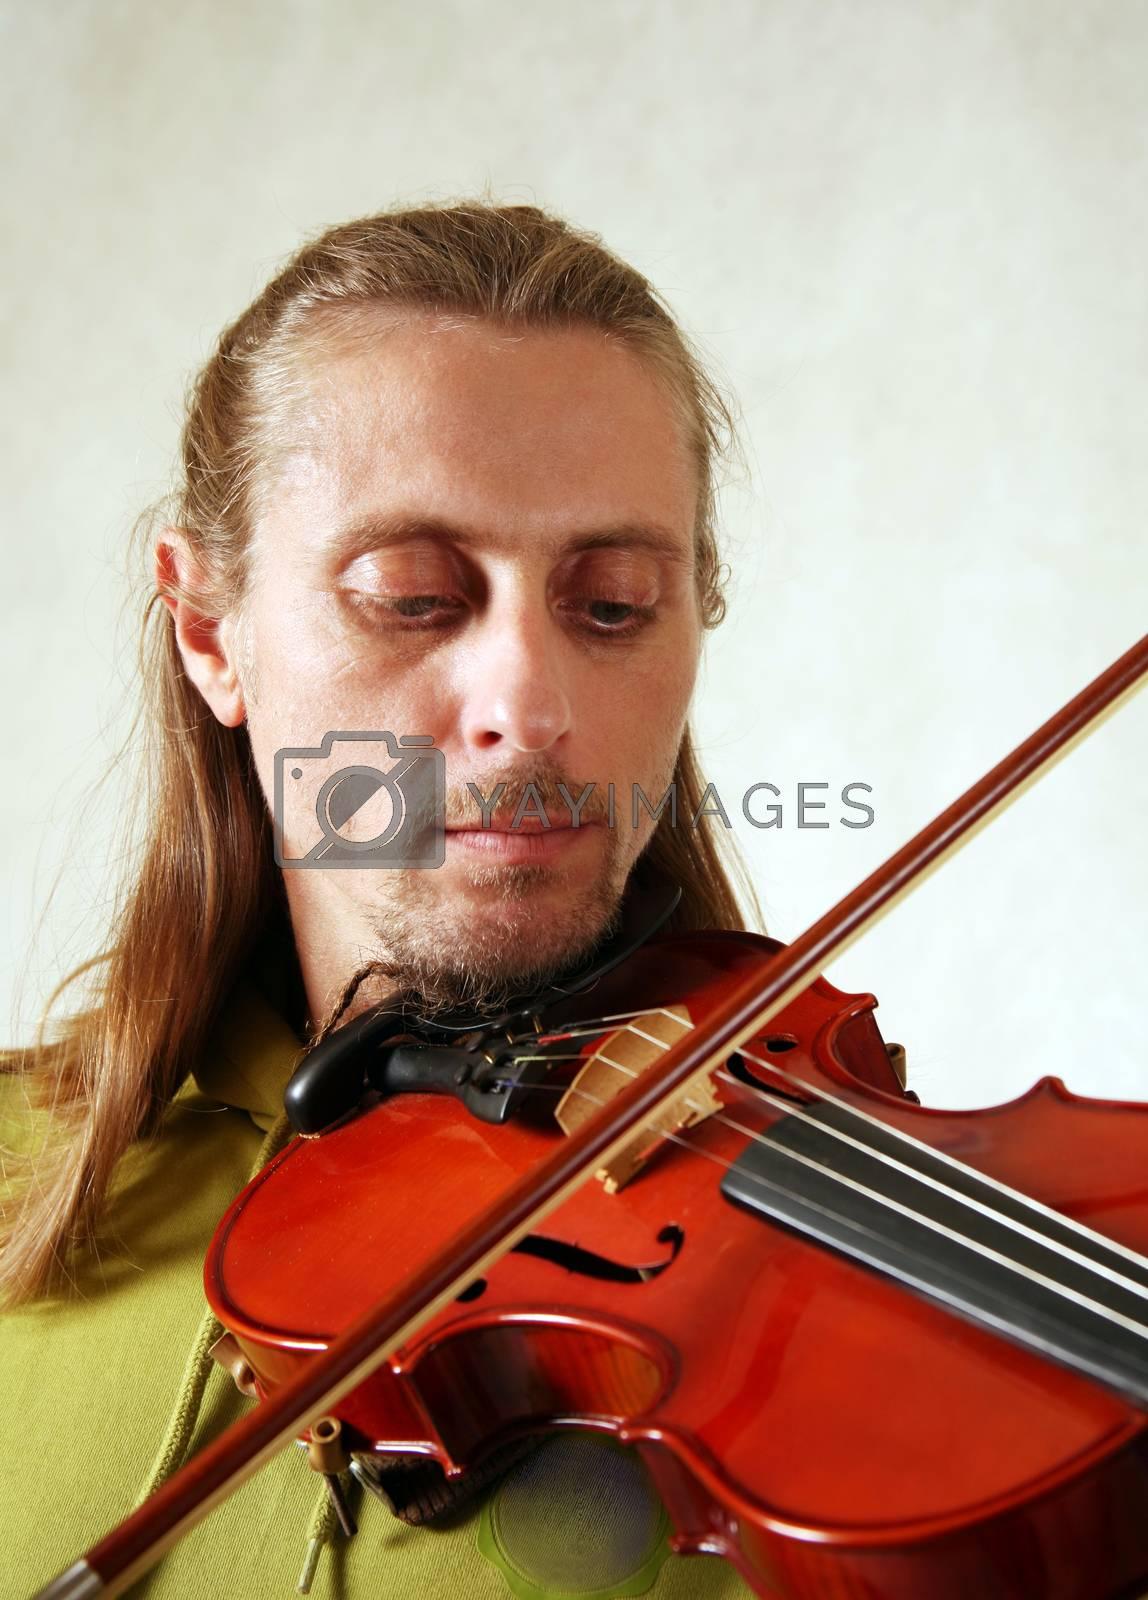 The man playing its violin close-up